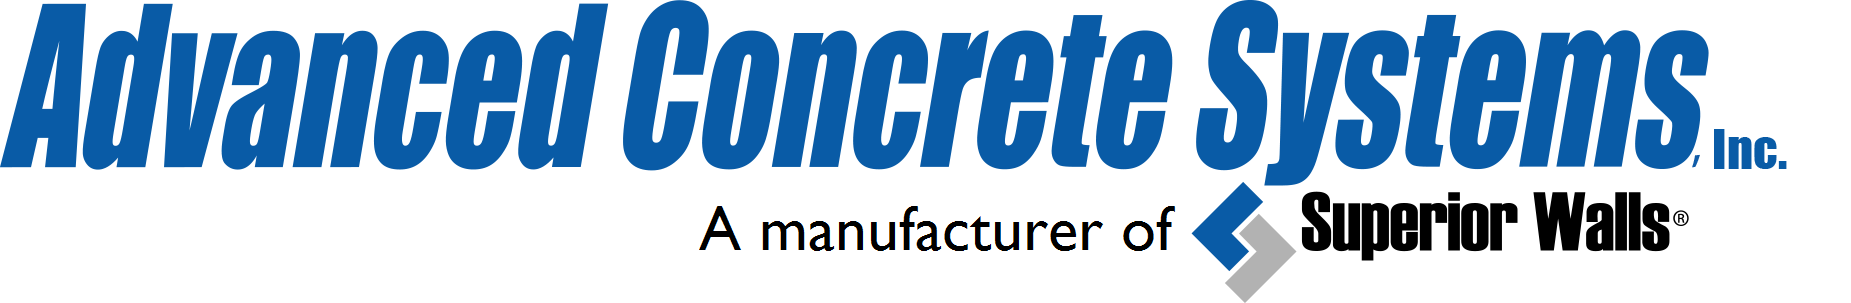 Advanced Concrete Systems